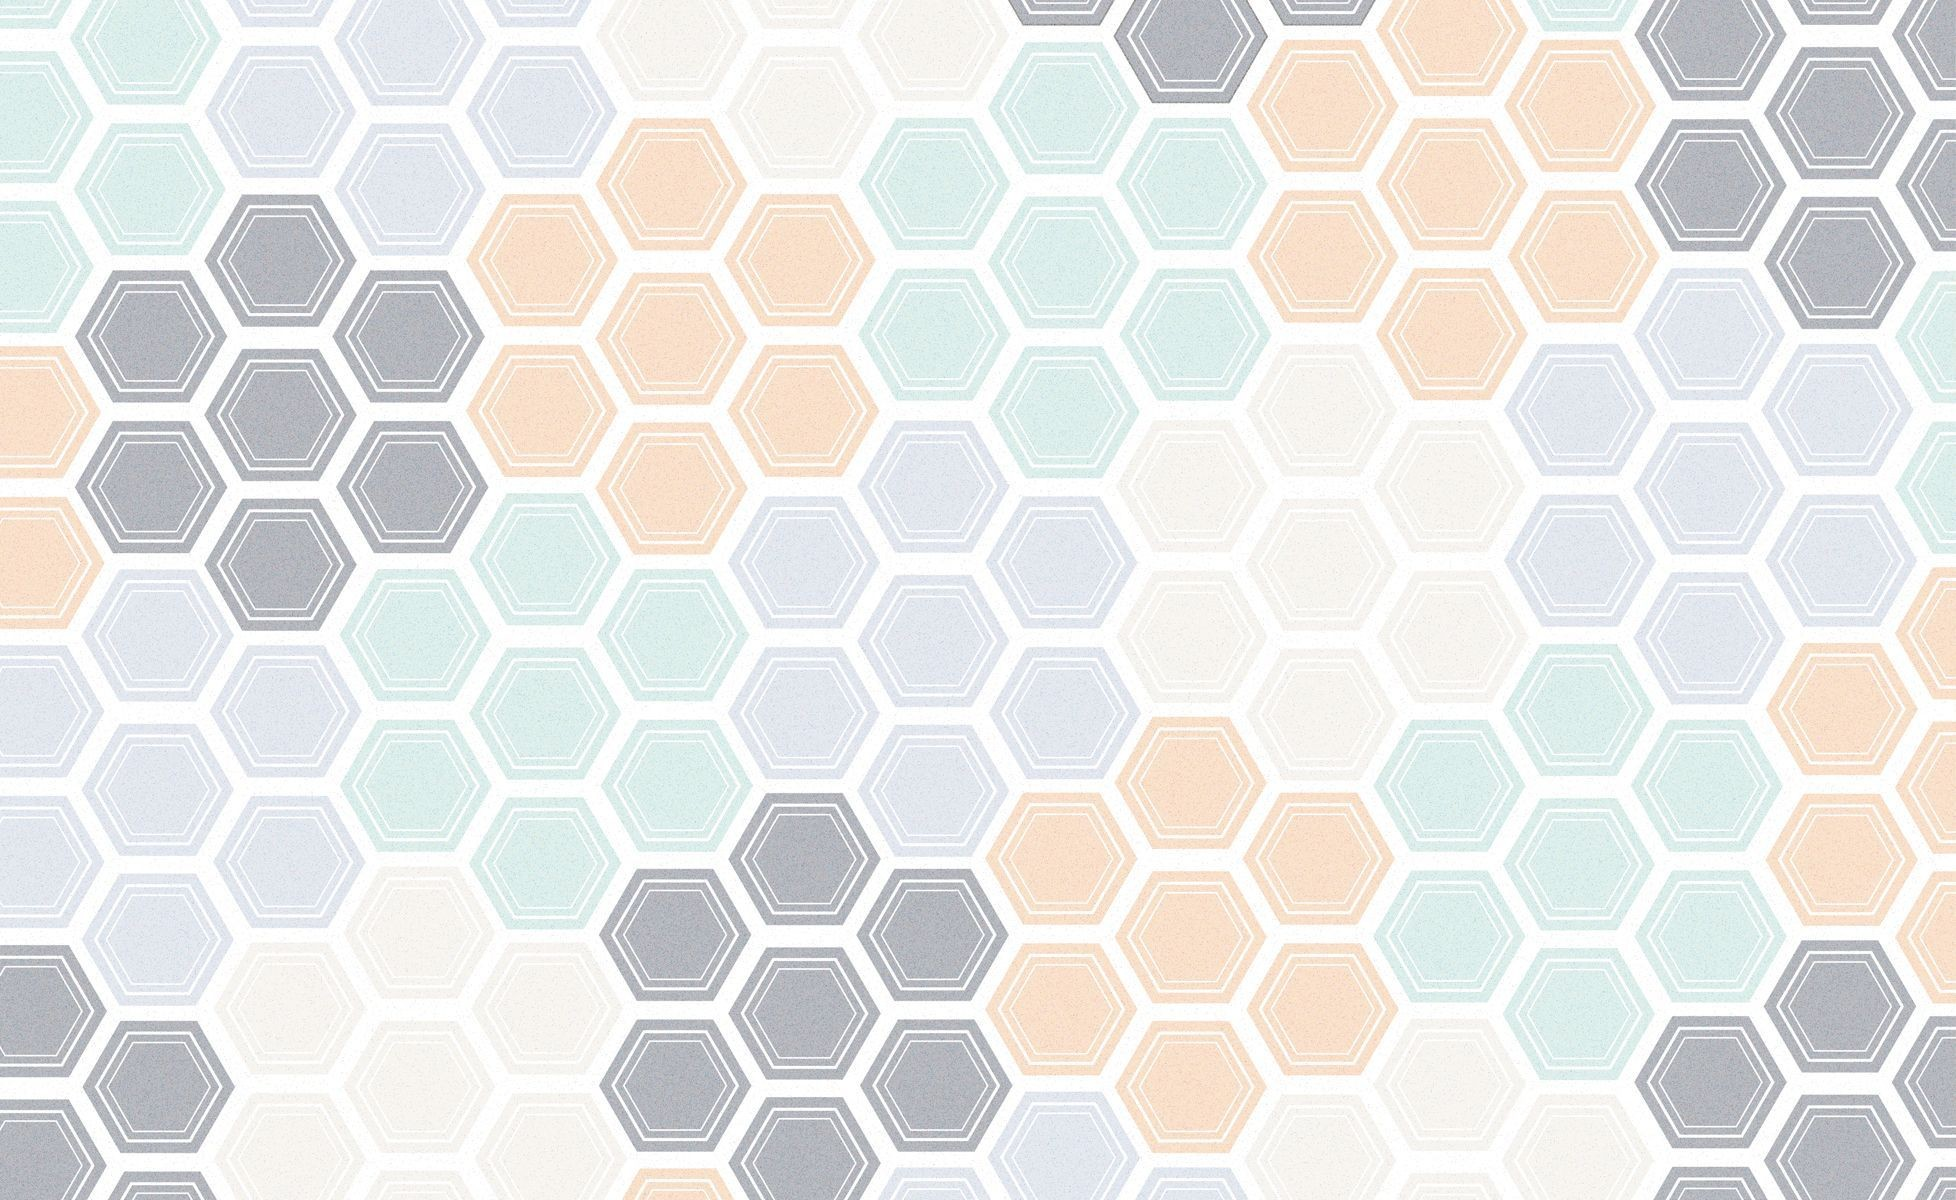 Honeycomb wallpaper ·① Download free beautiful HD ...